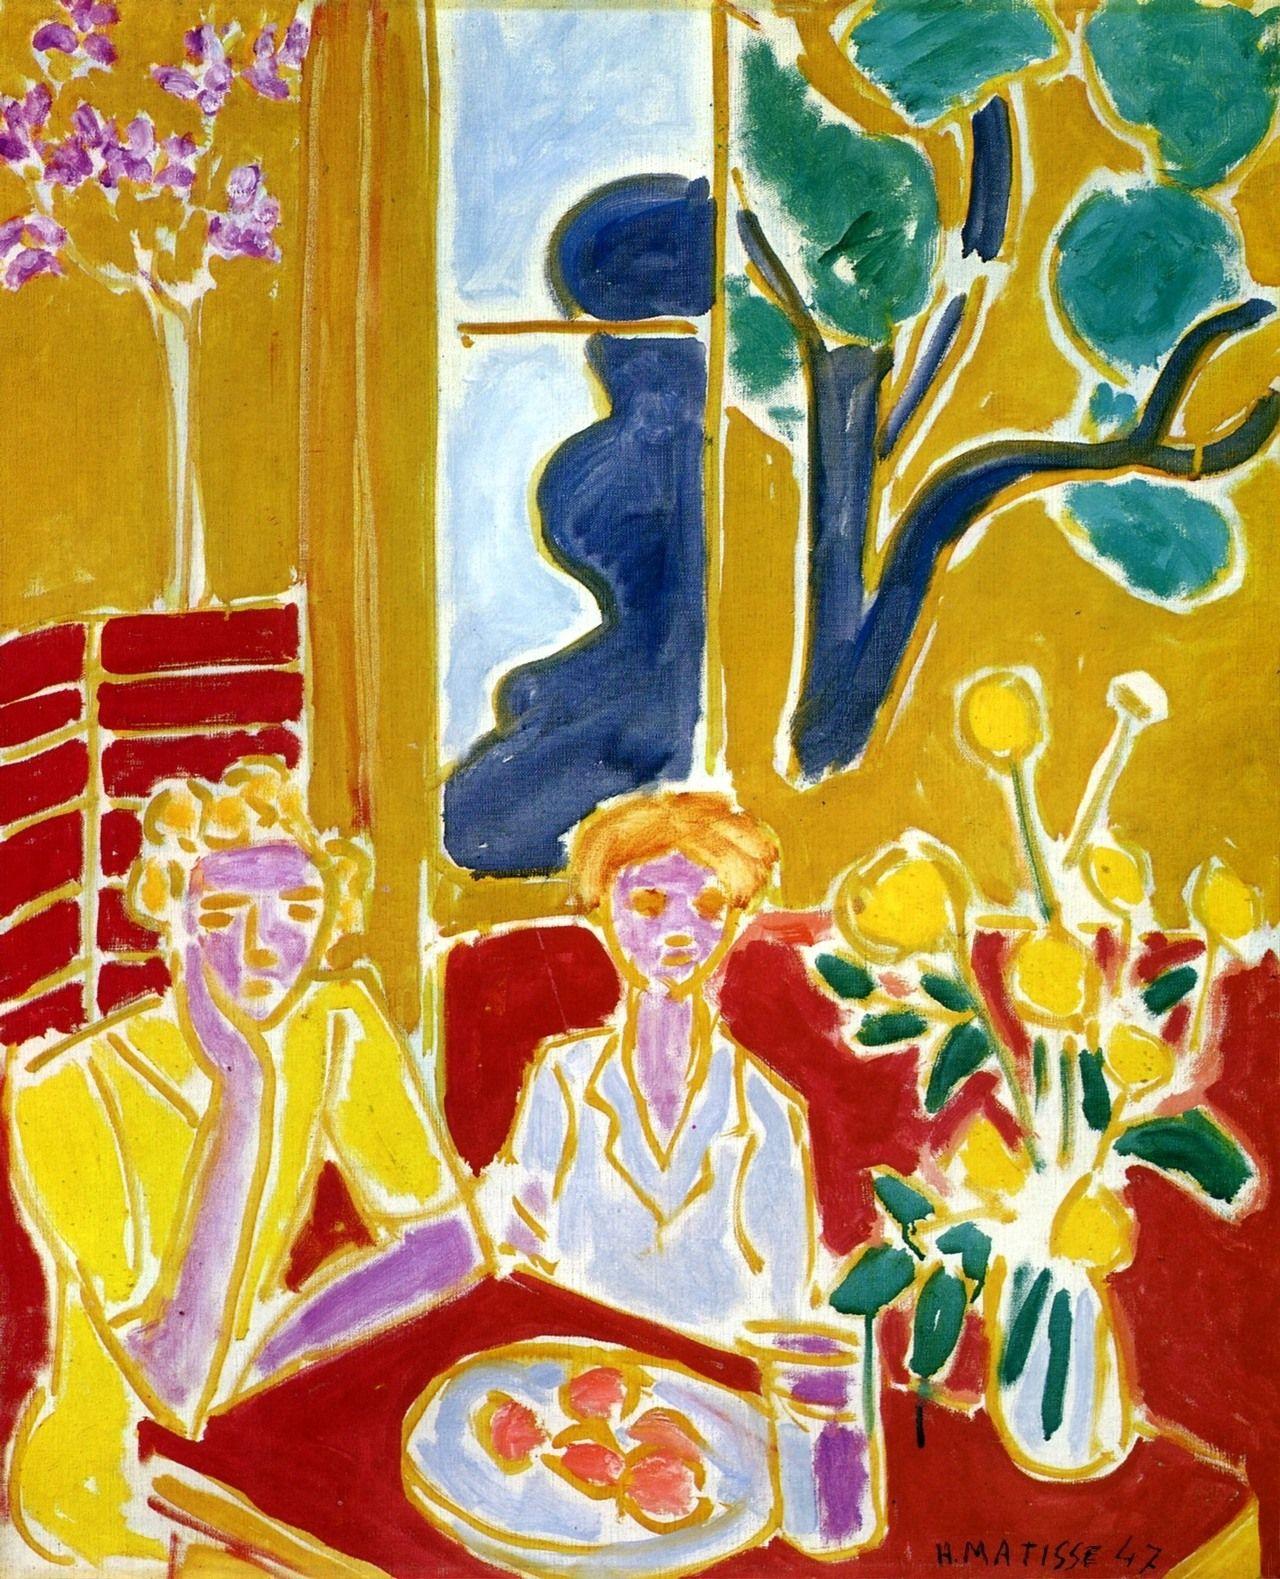 Two Women - Matisse | MATISSE | Pinterest | Henri matisse, Pintor y ...